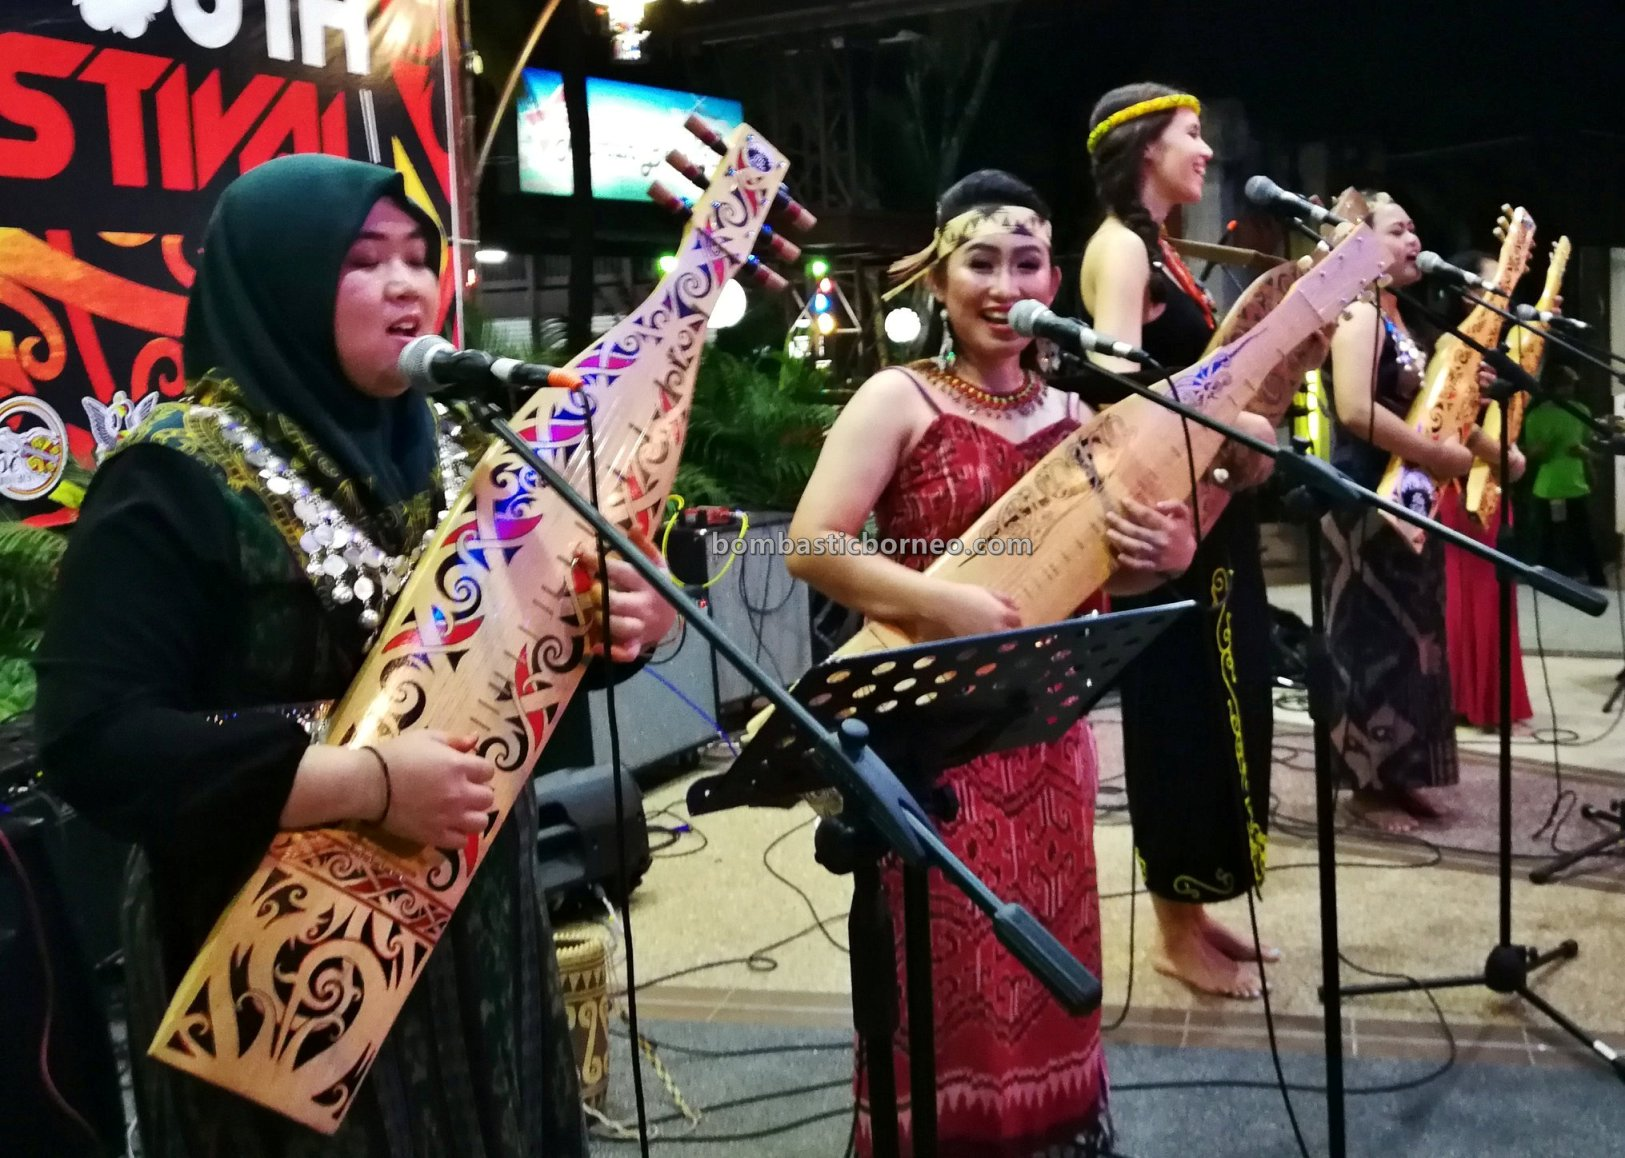 Youth Sape Festival, authentic, backpackers, Ethnic, native, tribal, indigenous, orang ulu, Malaysia, Tourism, travel guide, cross border, 婆罗洲达雅吉他, 砂拉越沙贝音乐, 马来西亚原住民